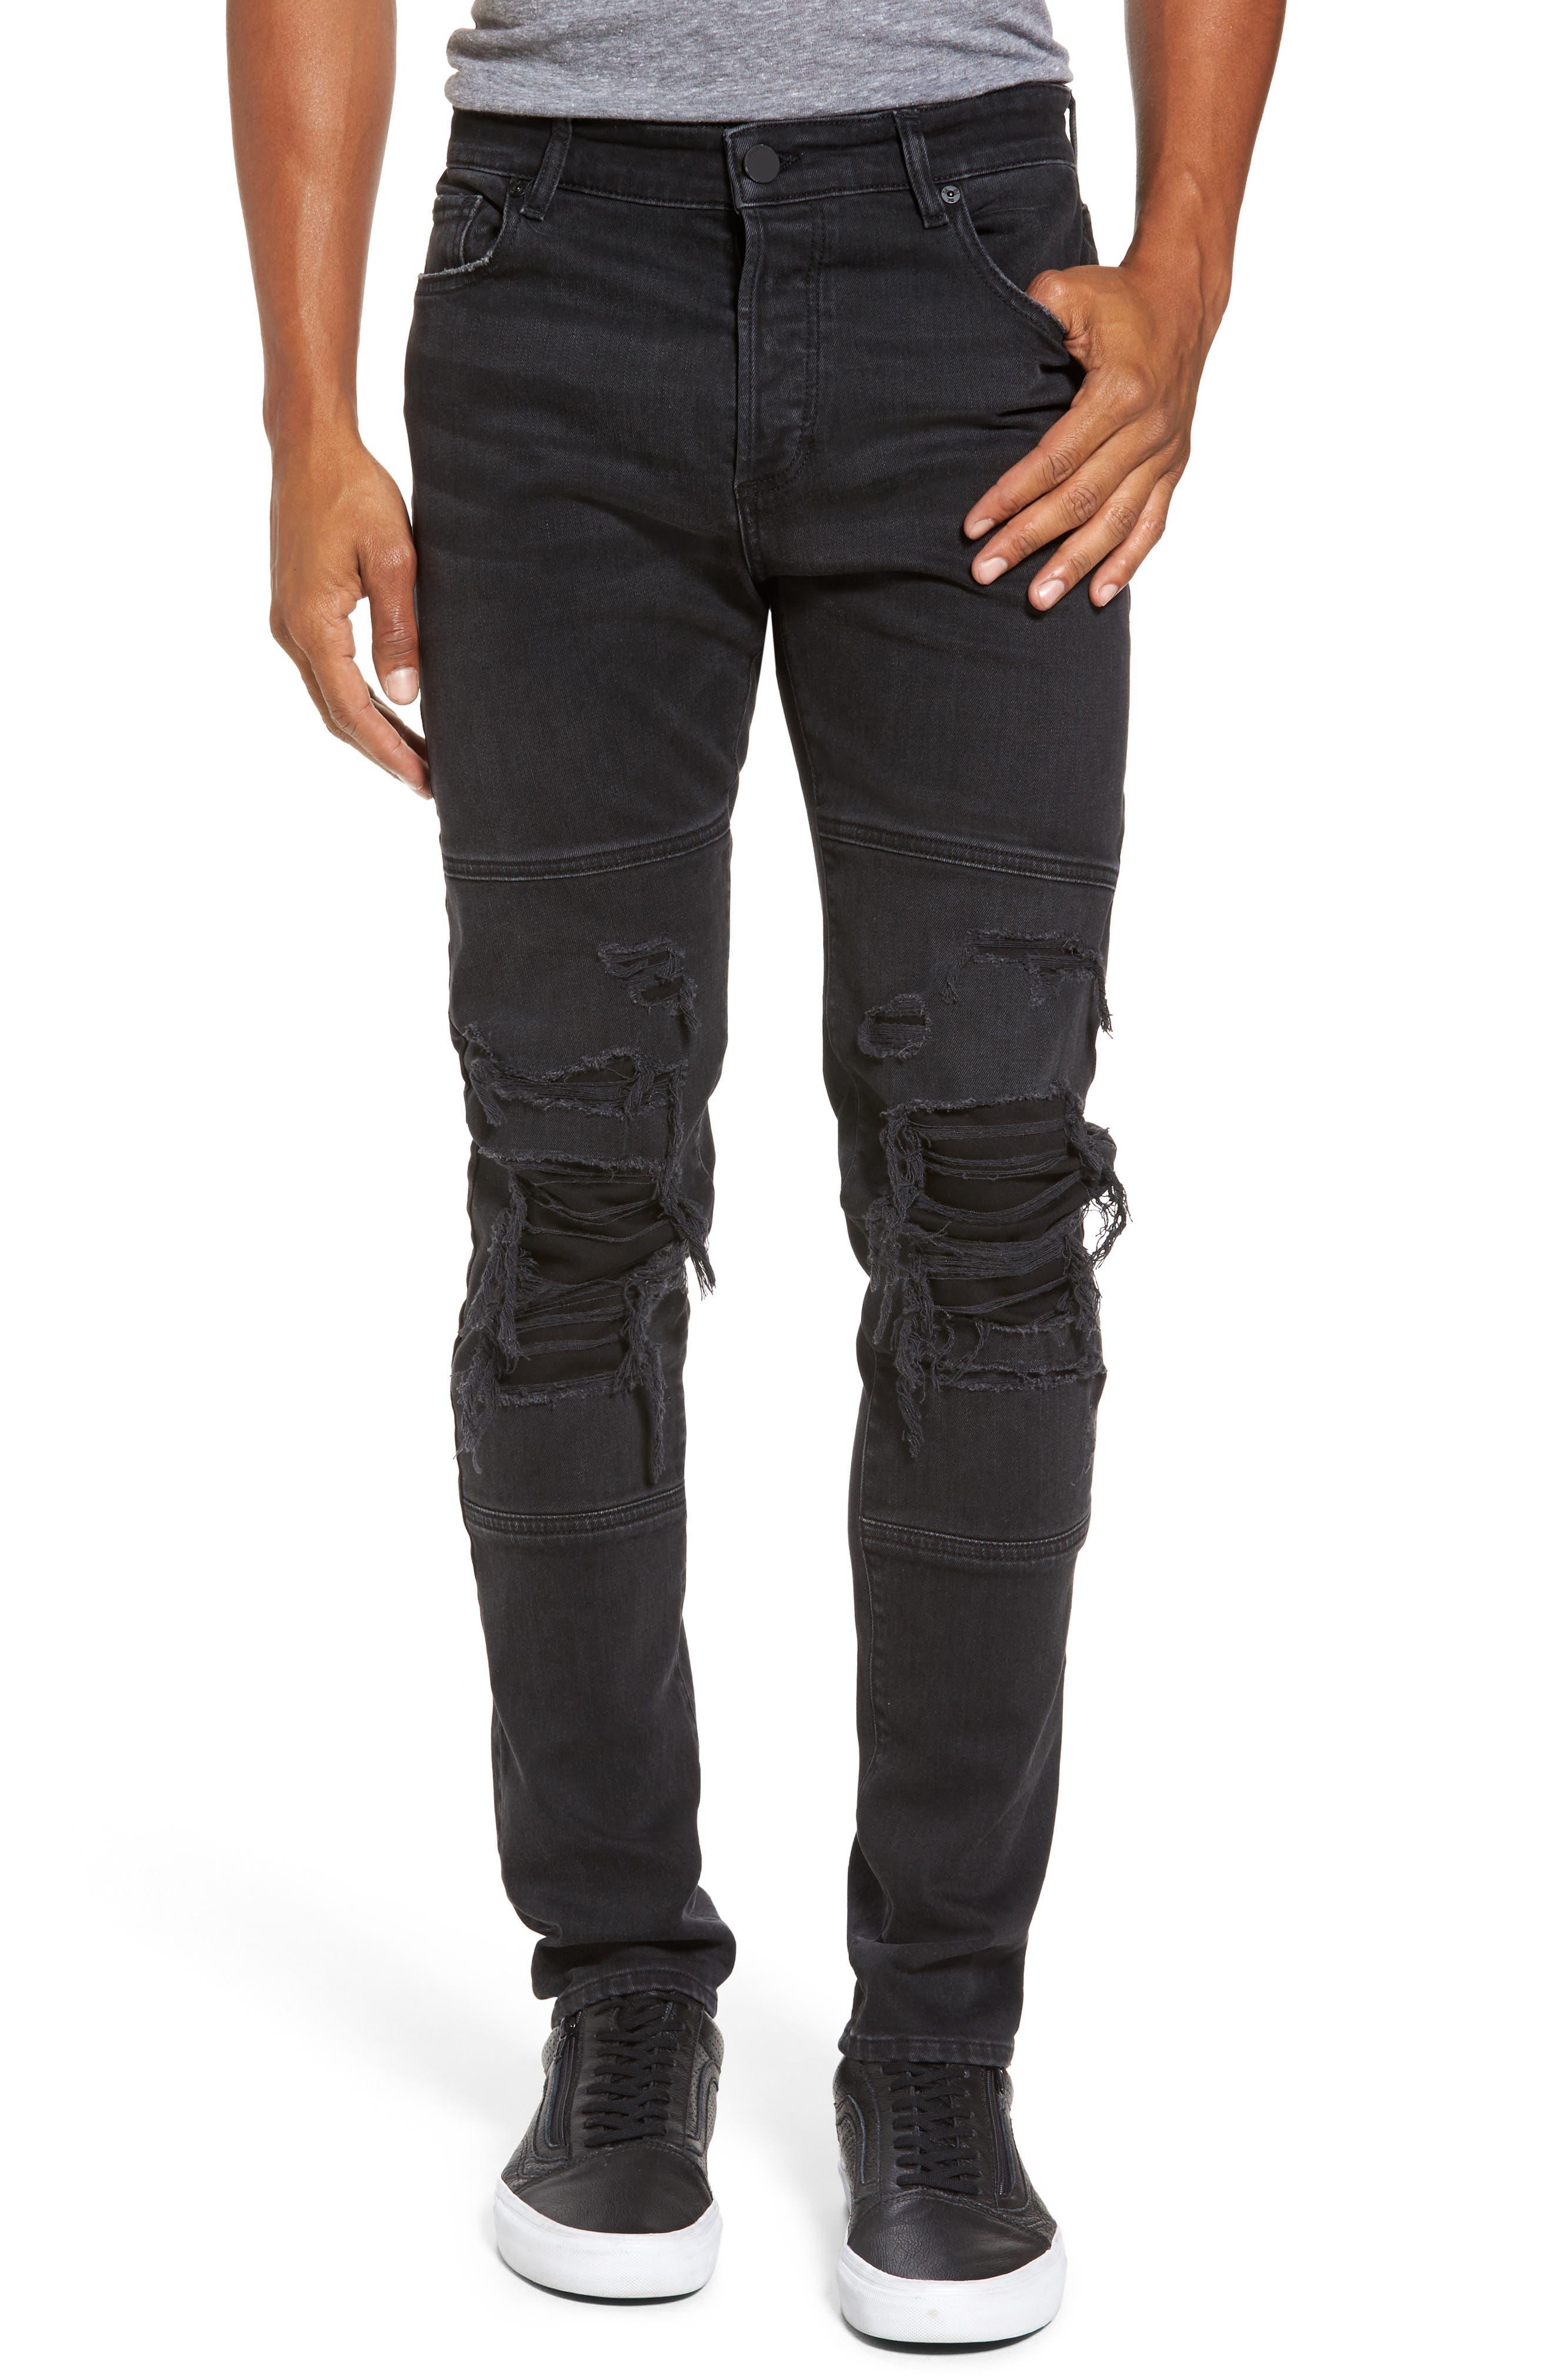 Hunter Skinny Jeans,                         Main,                         color, 001